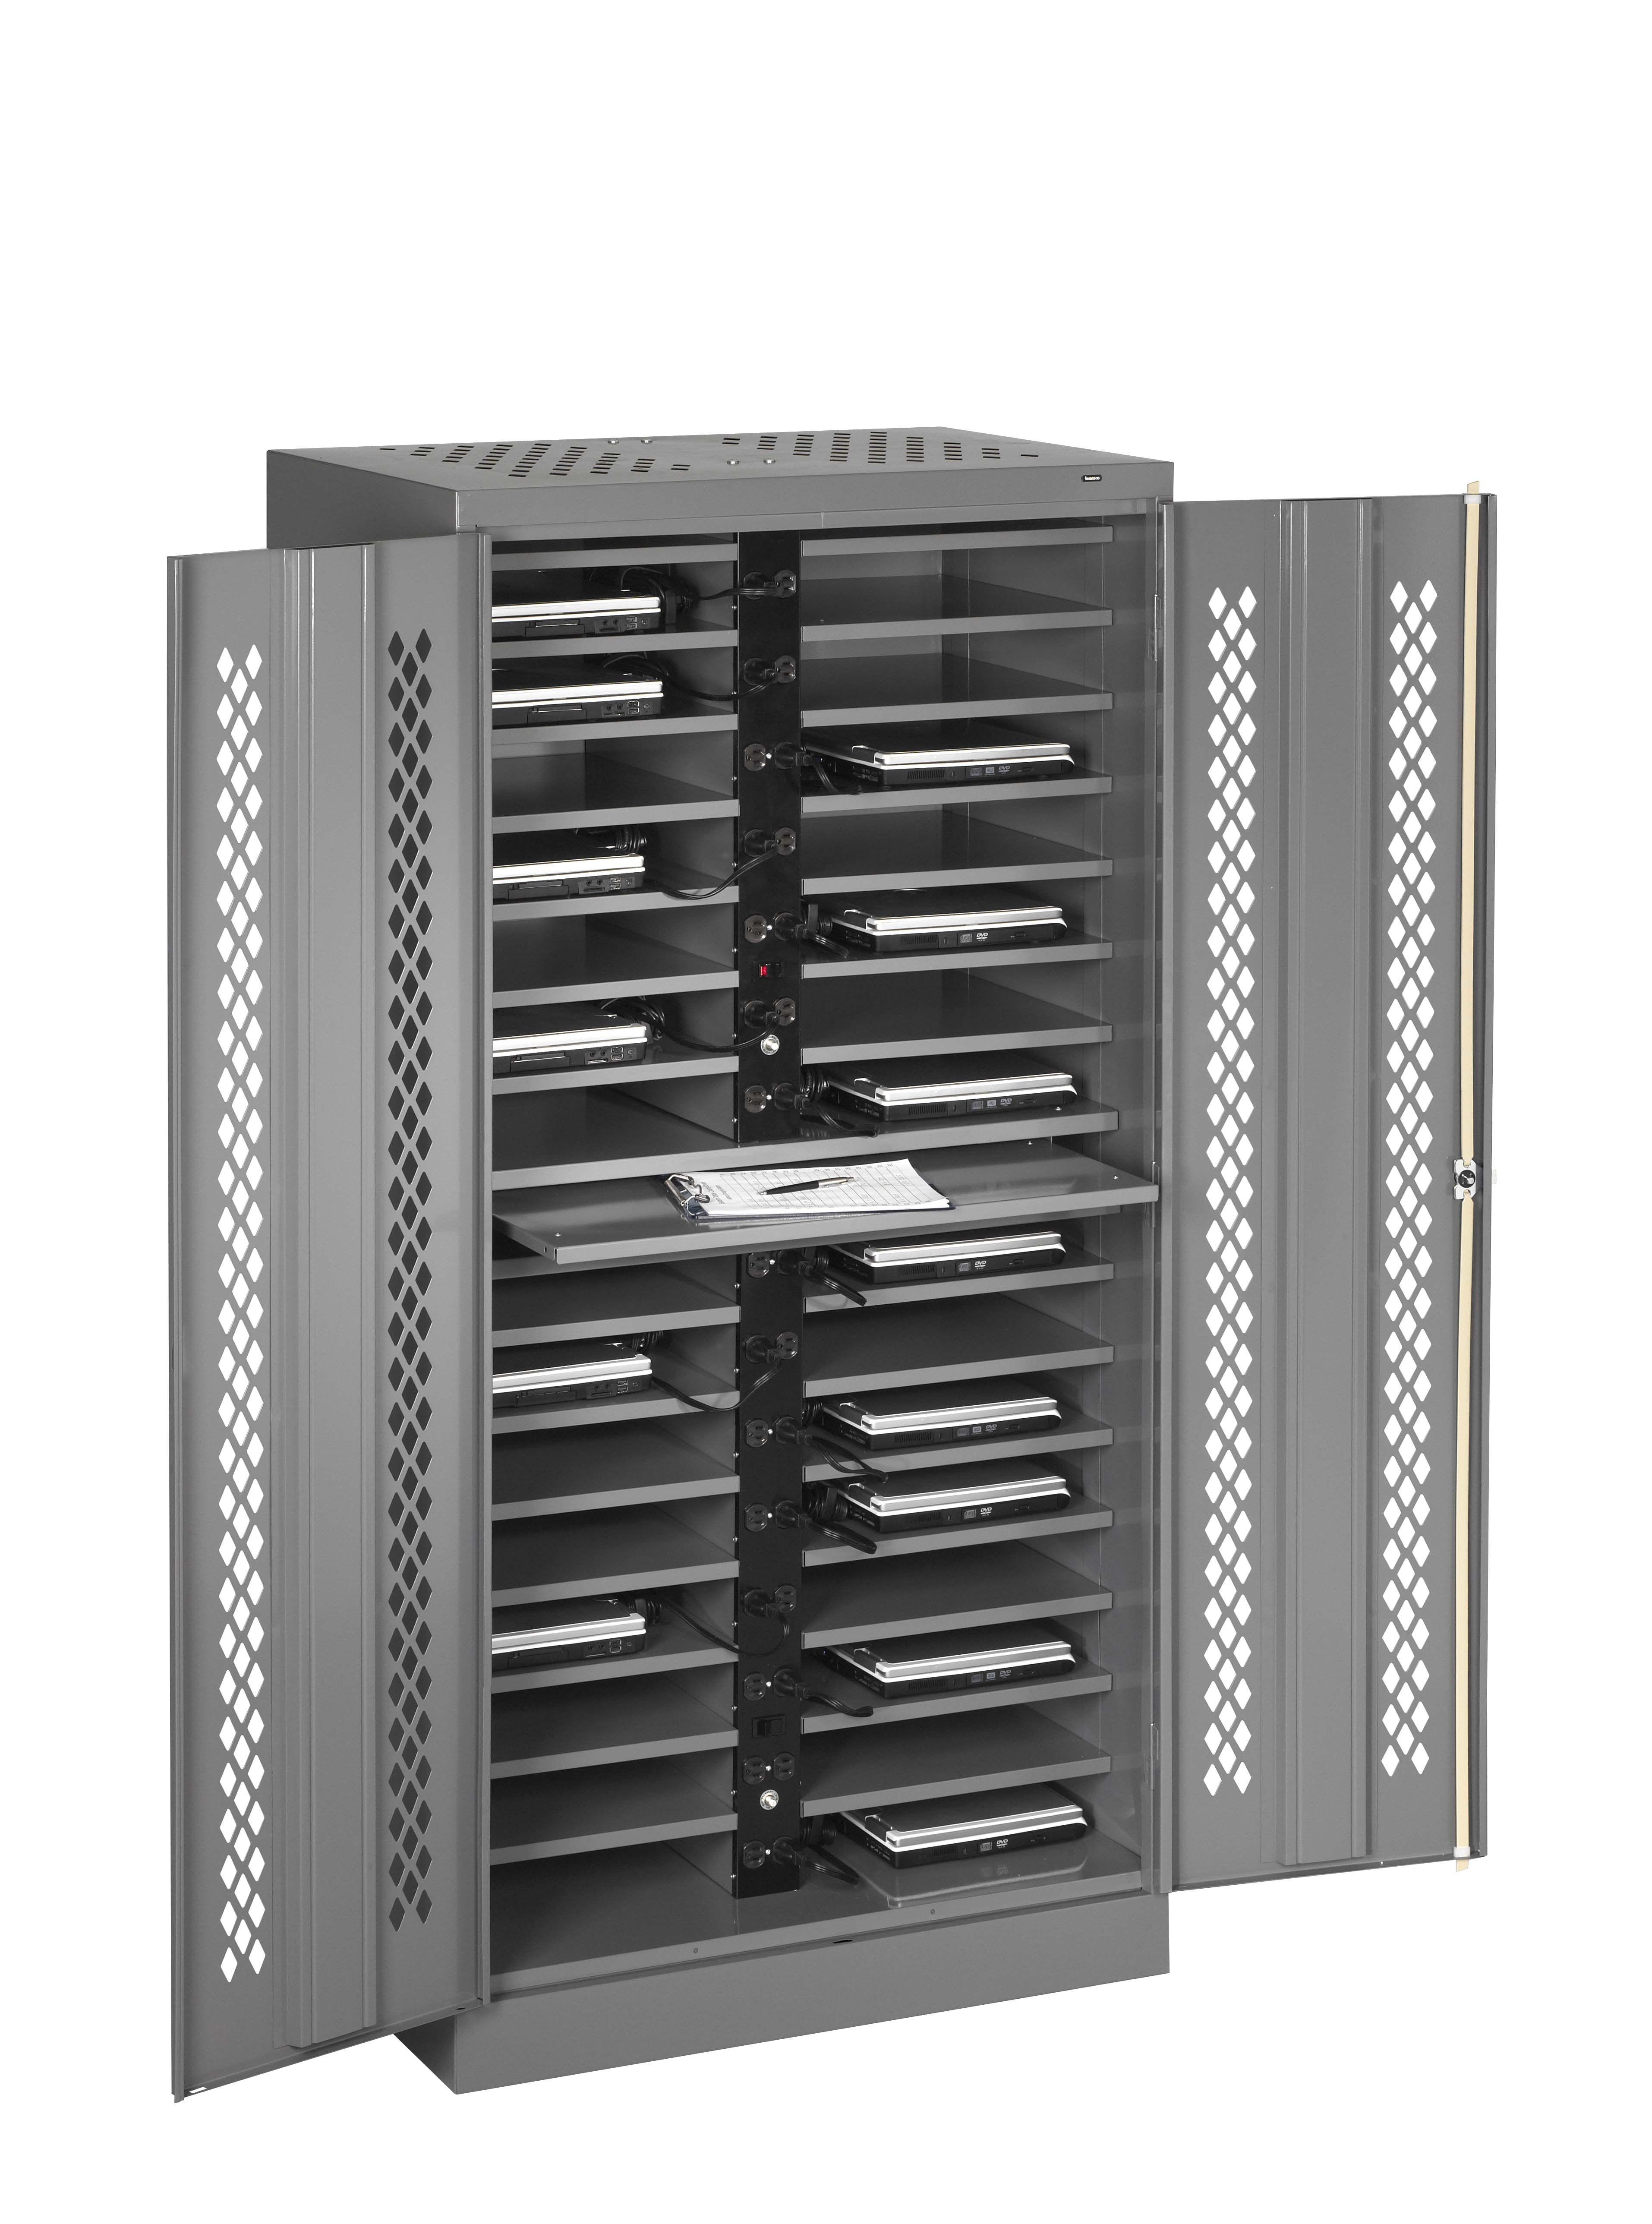 Secure Laptop Storage Cabinets